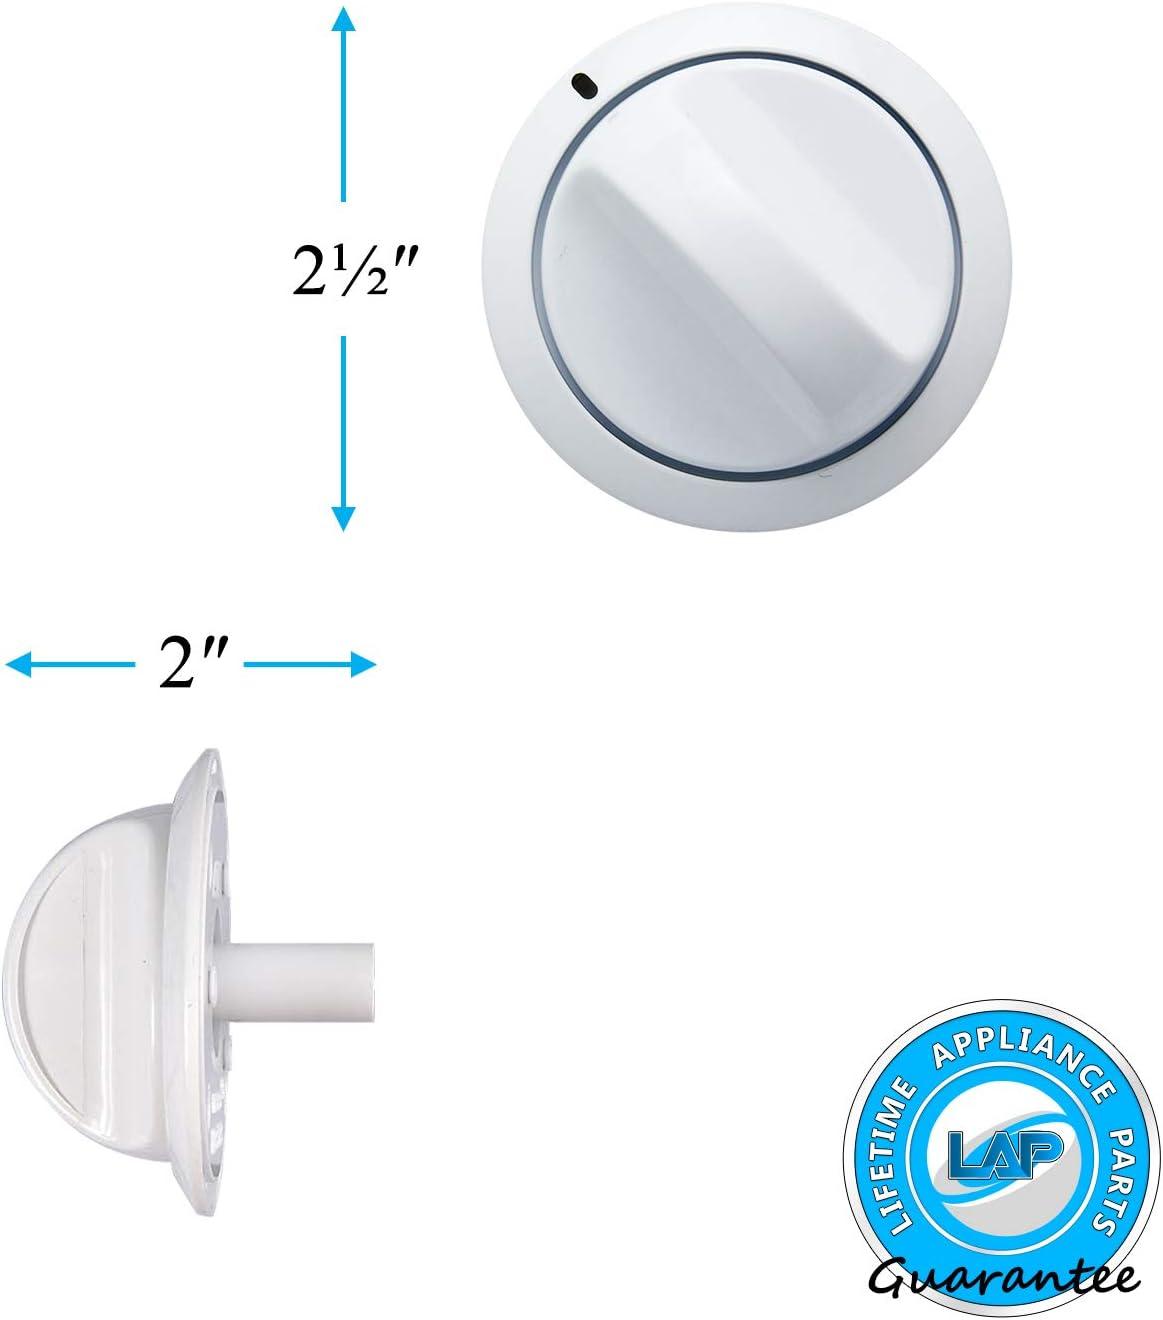 131873304 Genuine OEM Frigidaire Dryer White Timer Knob 1318733 131167804